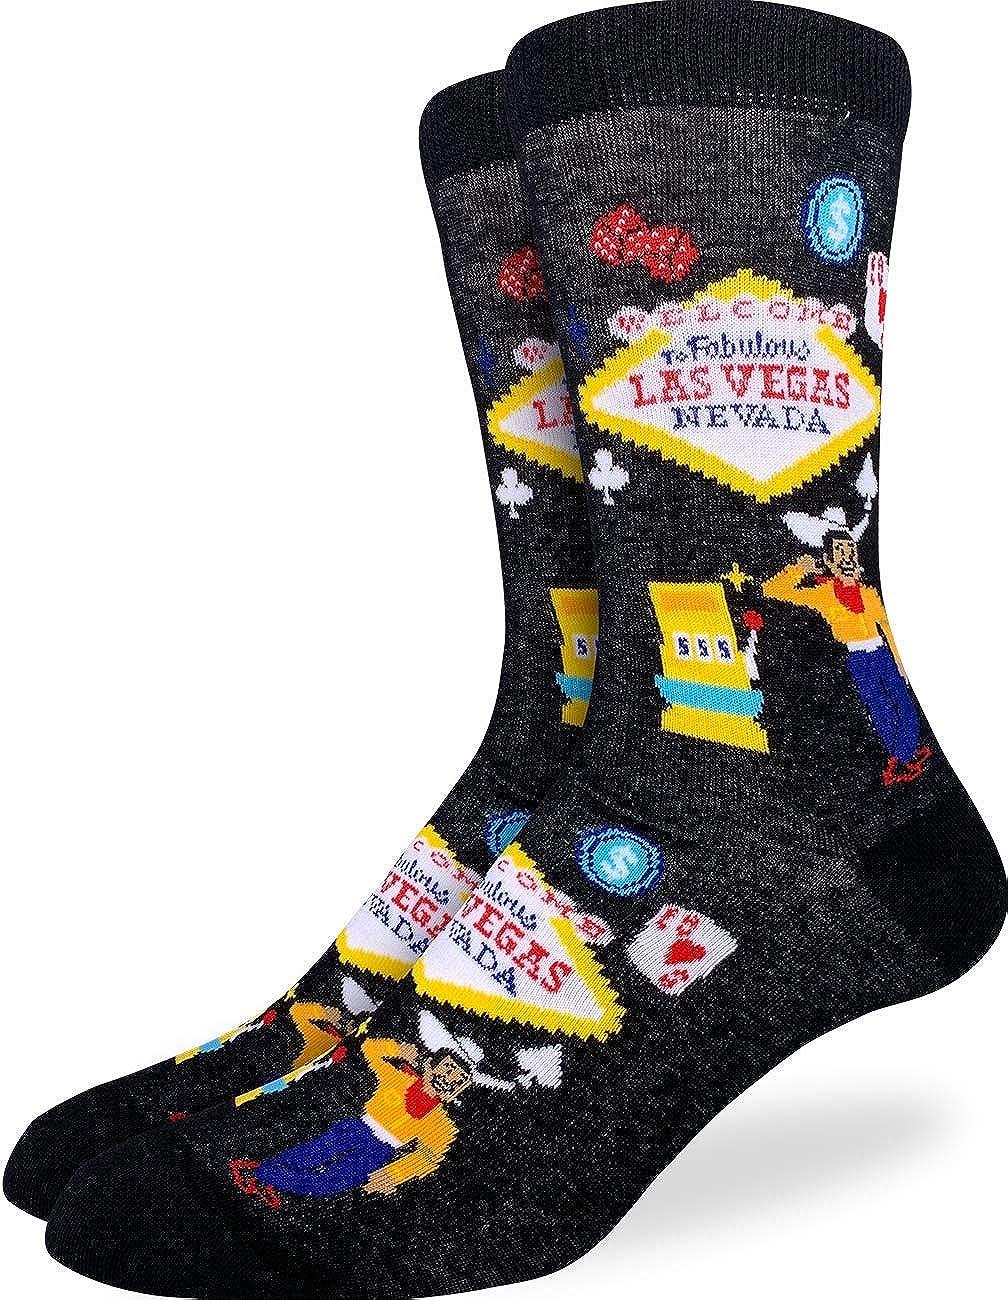 Black Good Luck Sock Womens Las Vegas Socks Adult Shoe Size 5-9